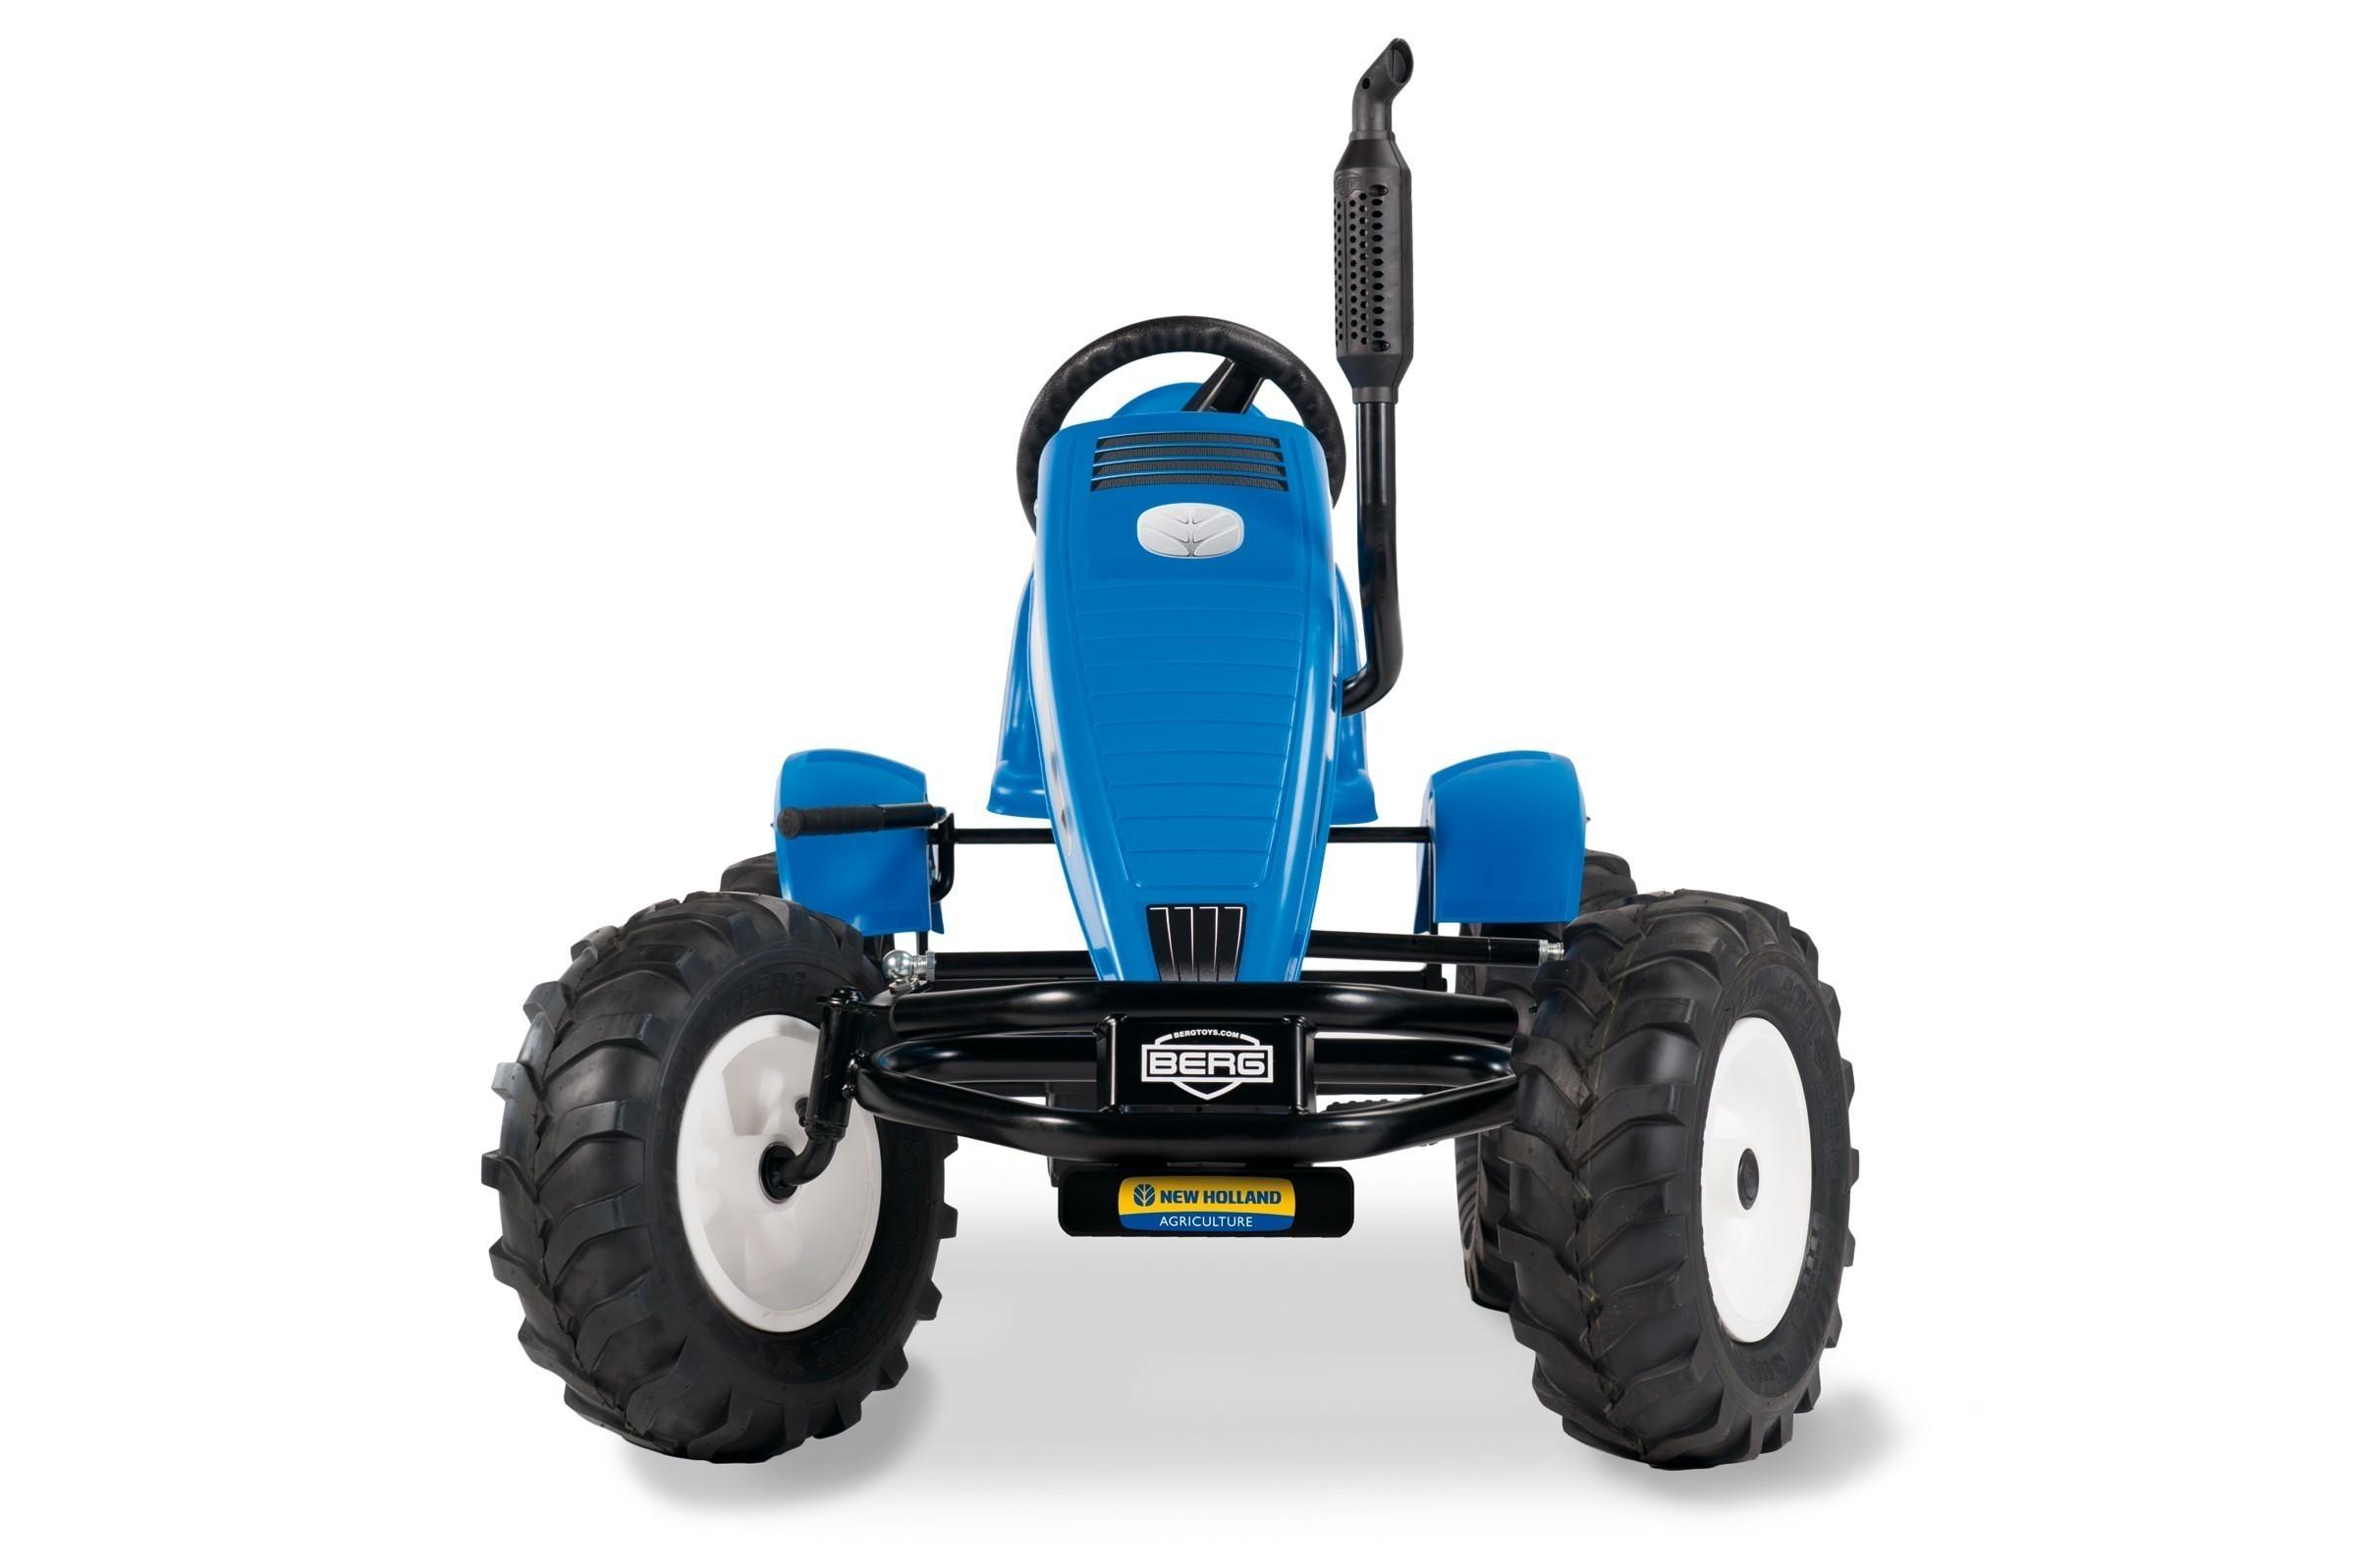 gokart pedal gokart new holland bfr 3 berg toys bei. Black Bedroom Furniture Sets. Home Design Ideas